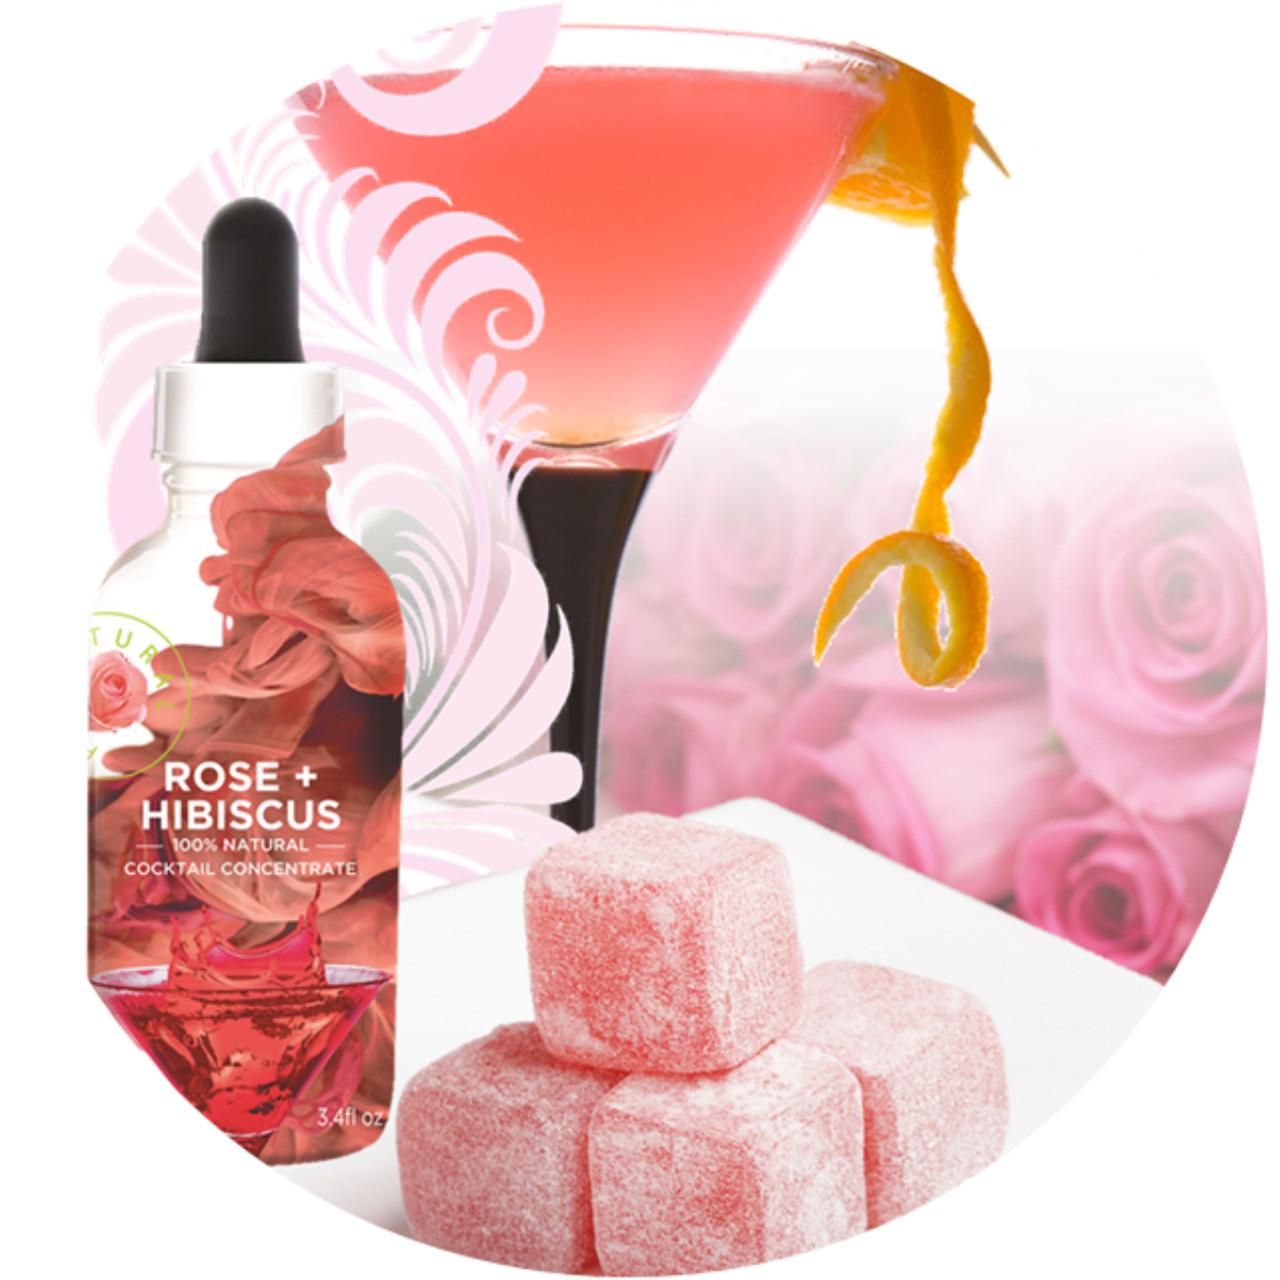 Wild Hibiscus Rose Hibiscus Floral Extract Samoras